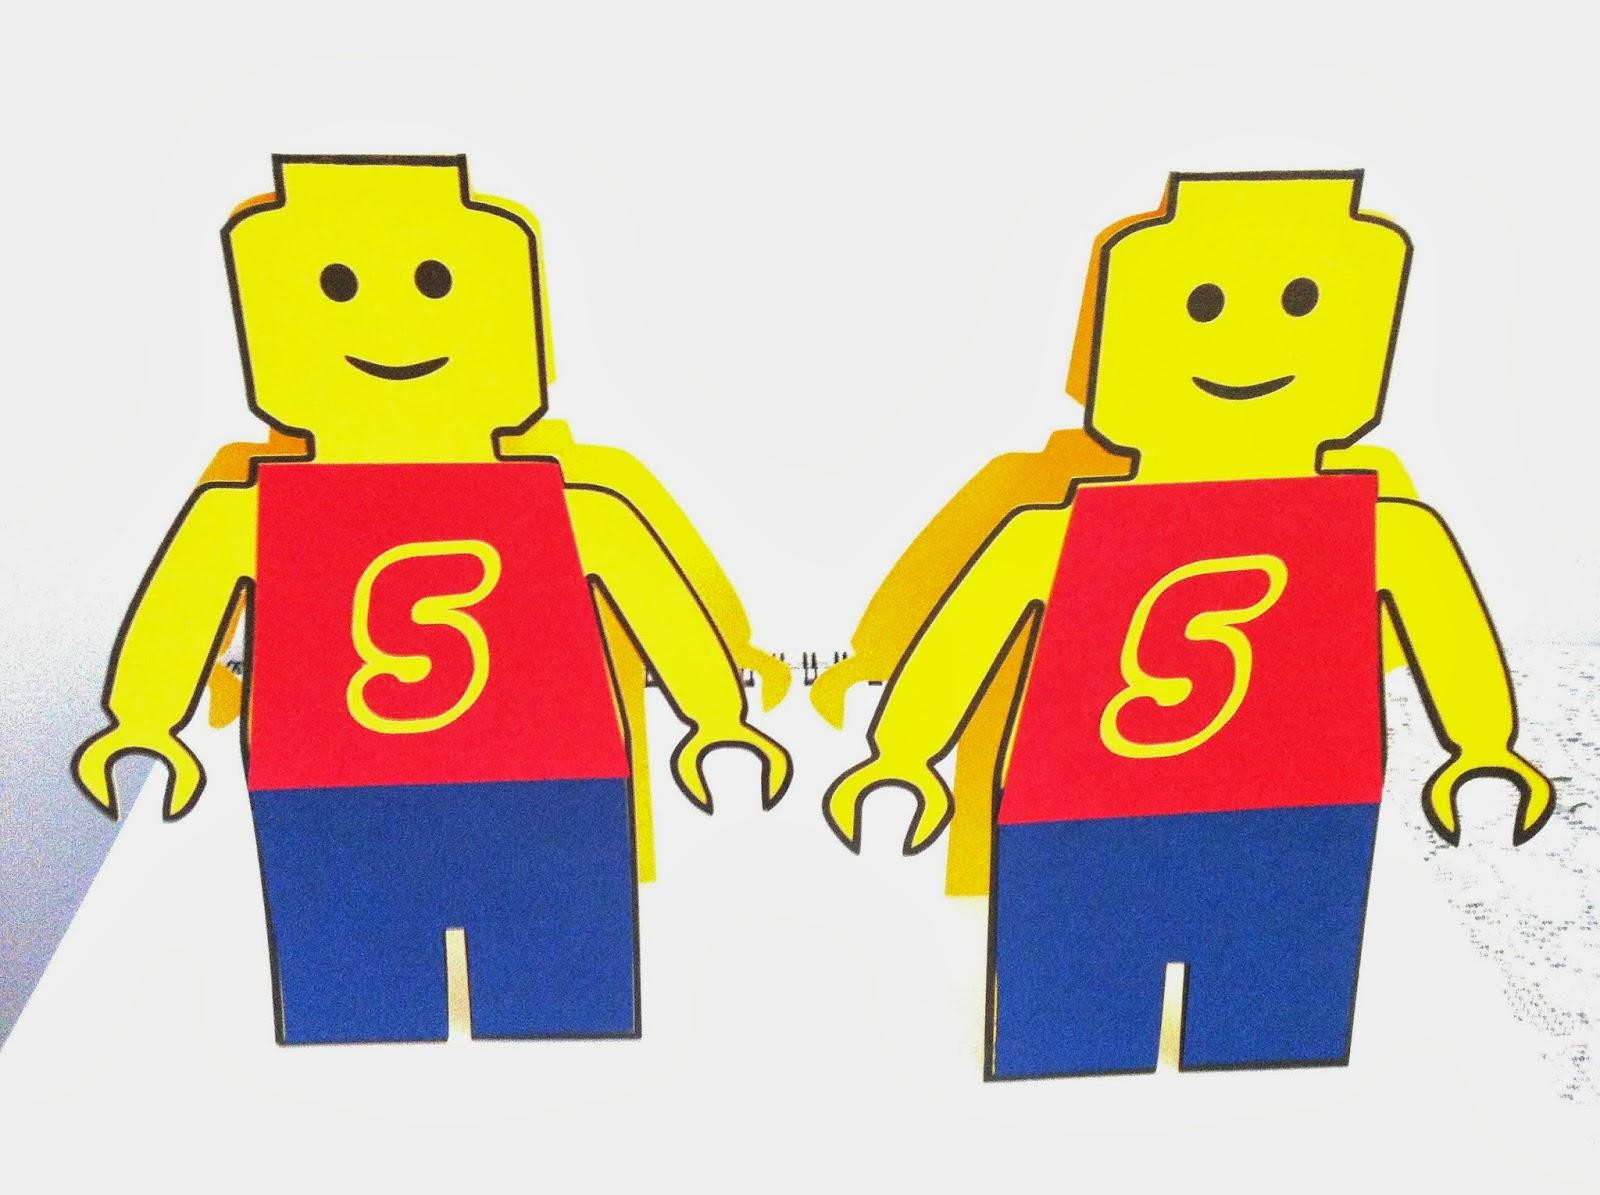 lego man birthday - photo #14